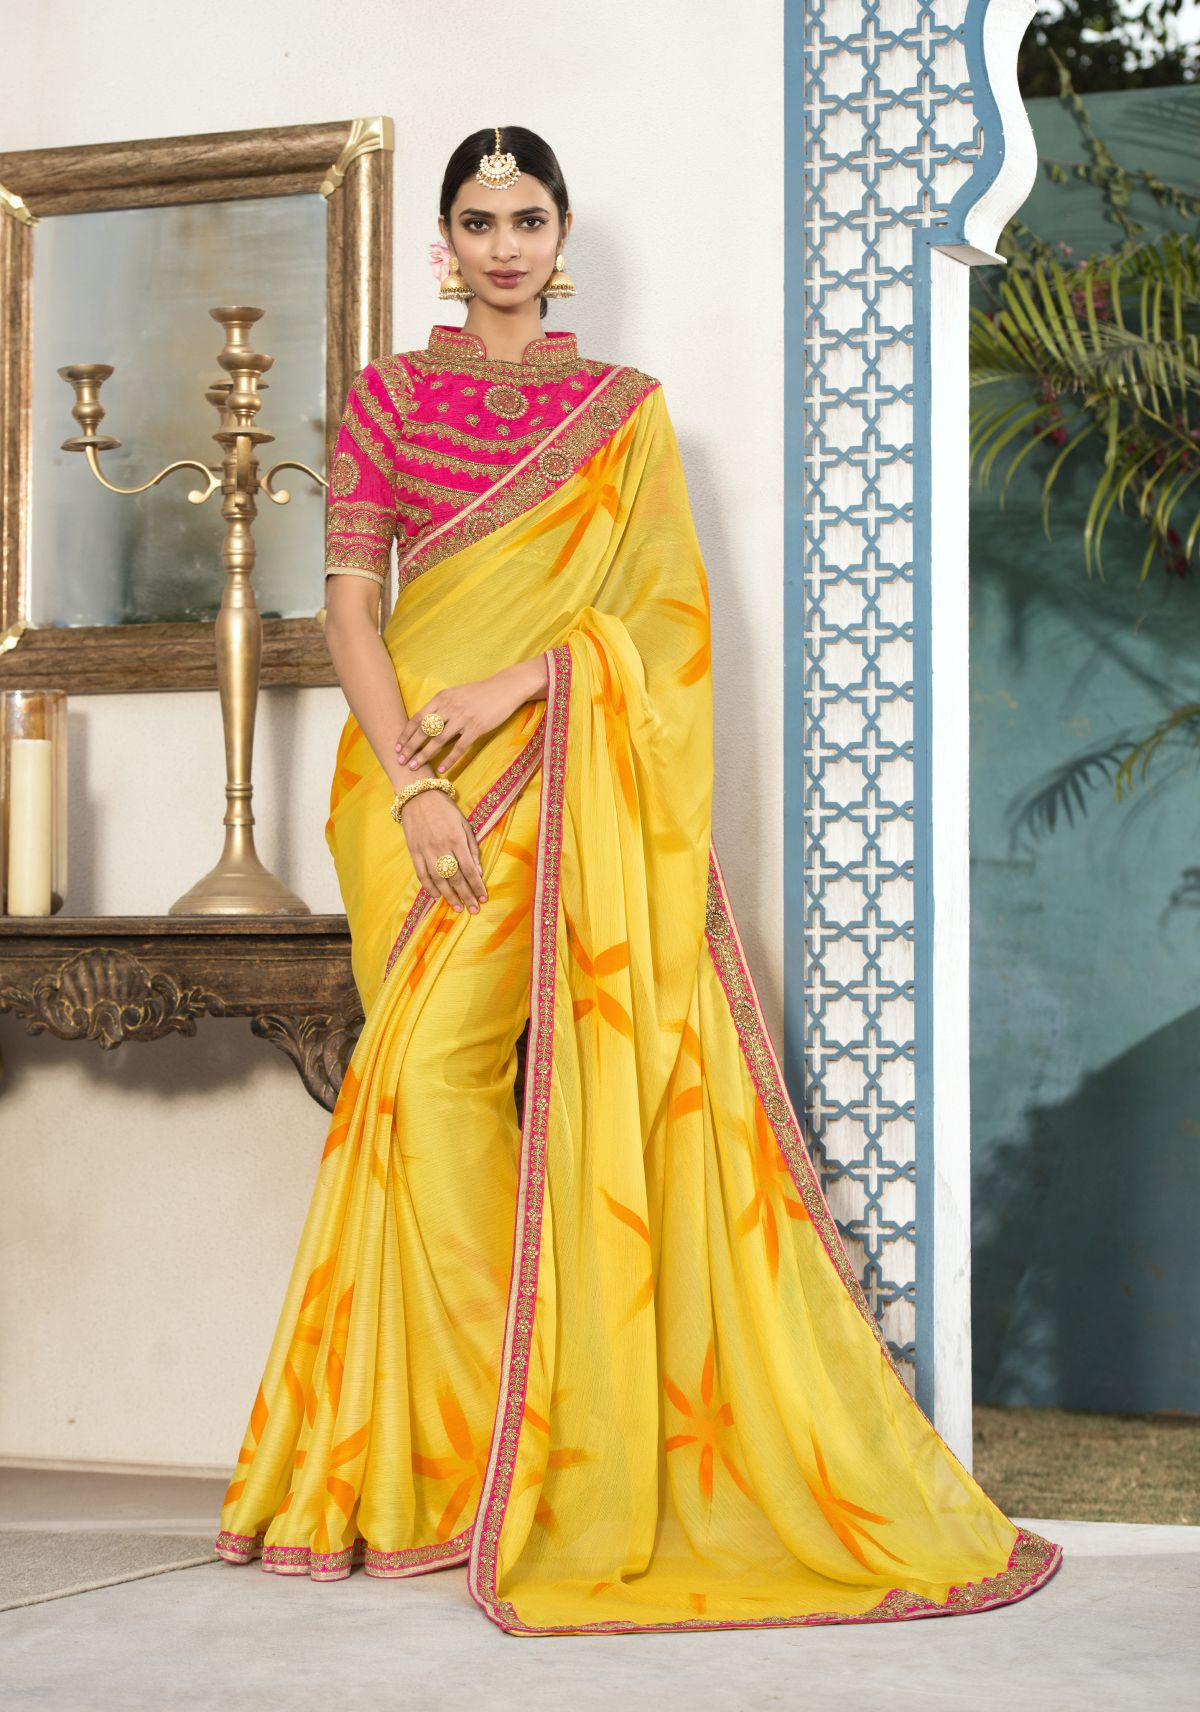 Embroidered Chiffon Saree in Yellow